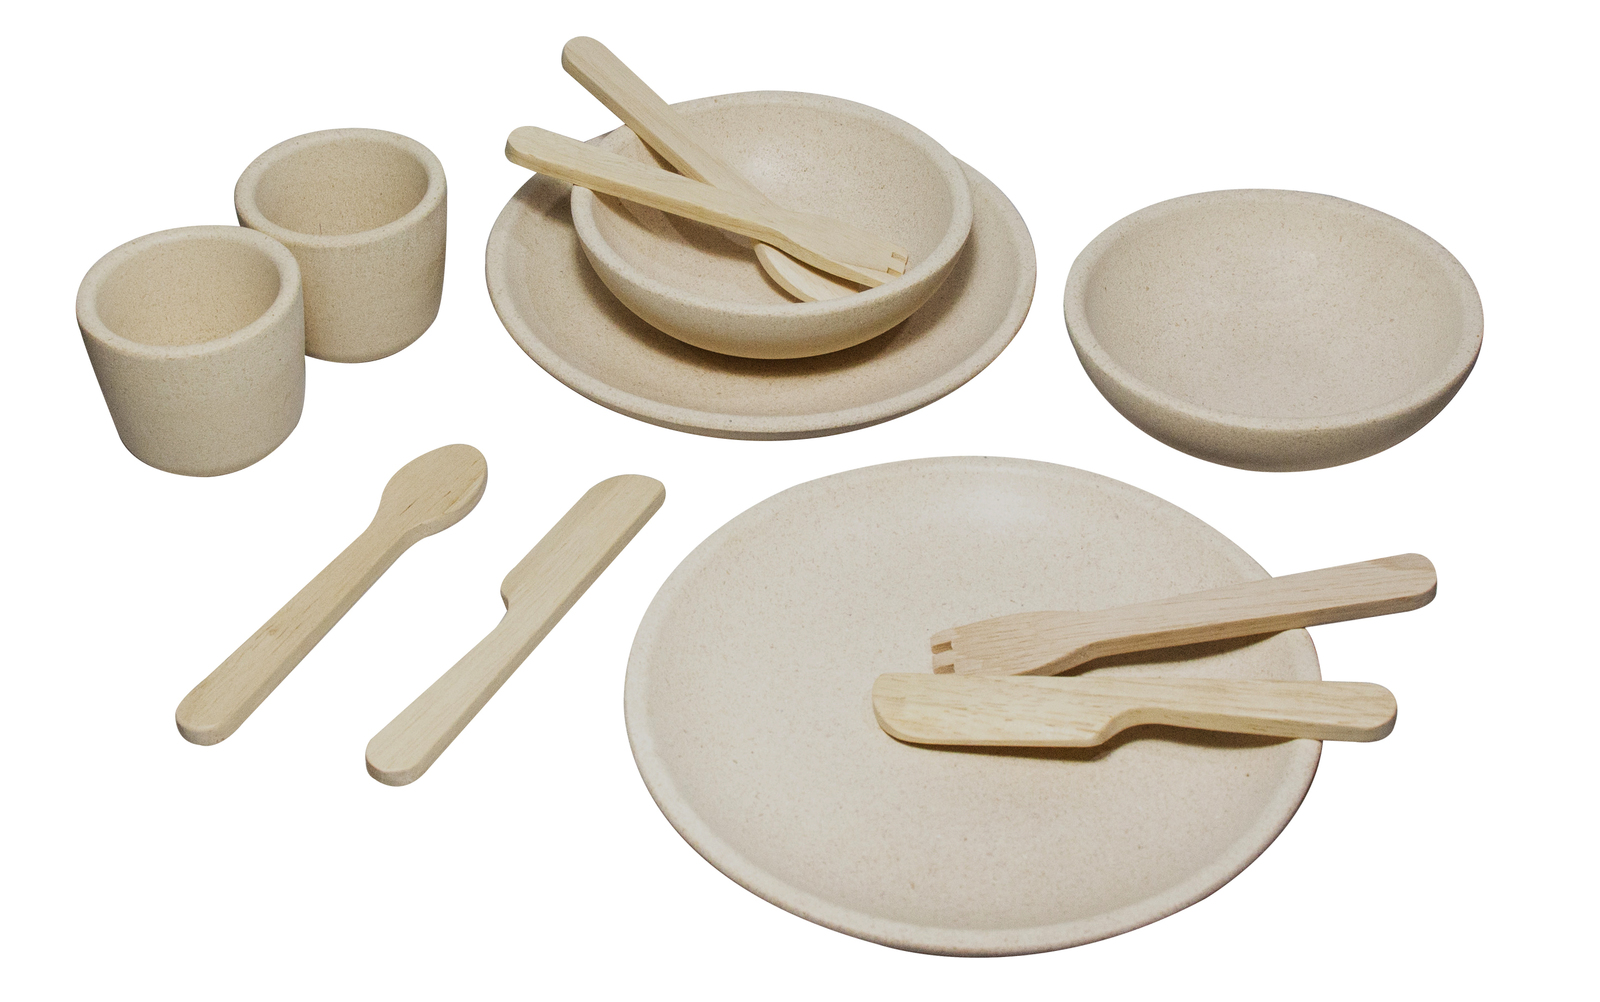 PlanToys - Wooden Tableware Set image